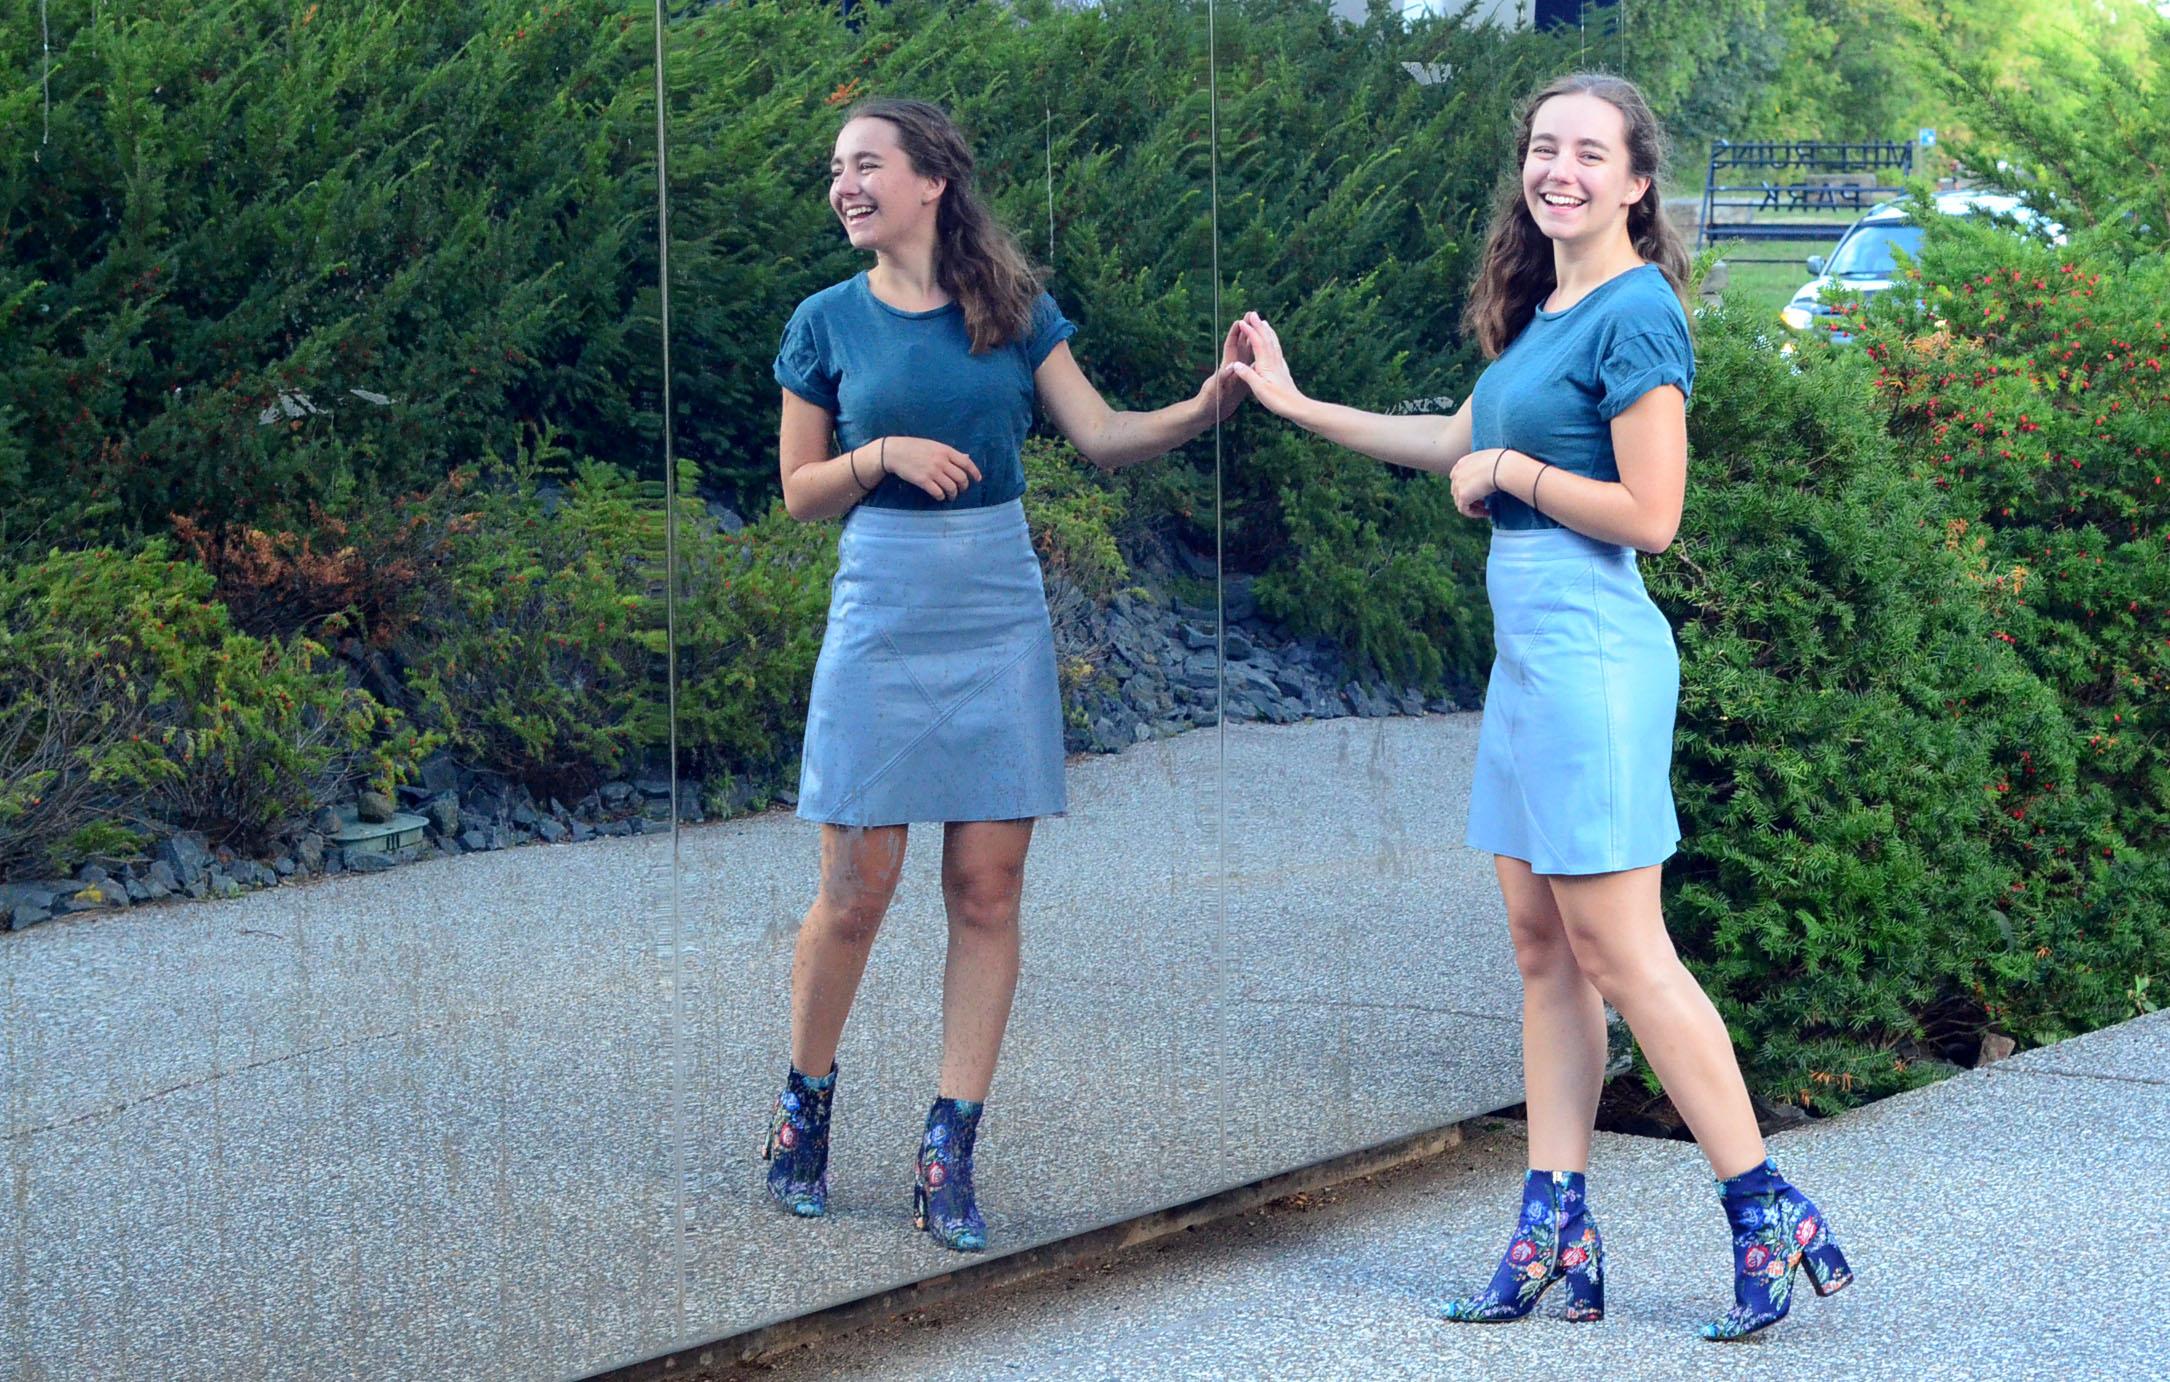 women-i-work-with-target-sammie-kaufman-mini-skirt-pattern-boots